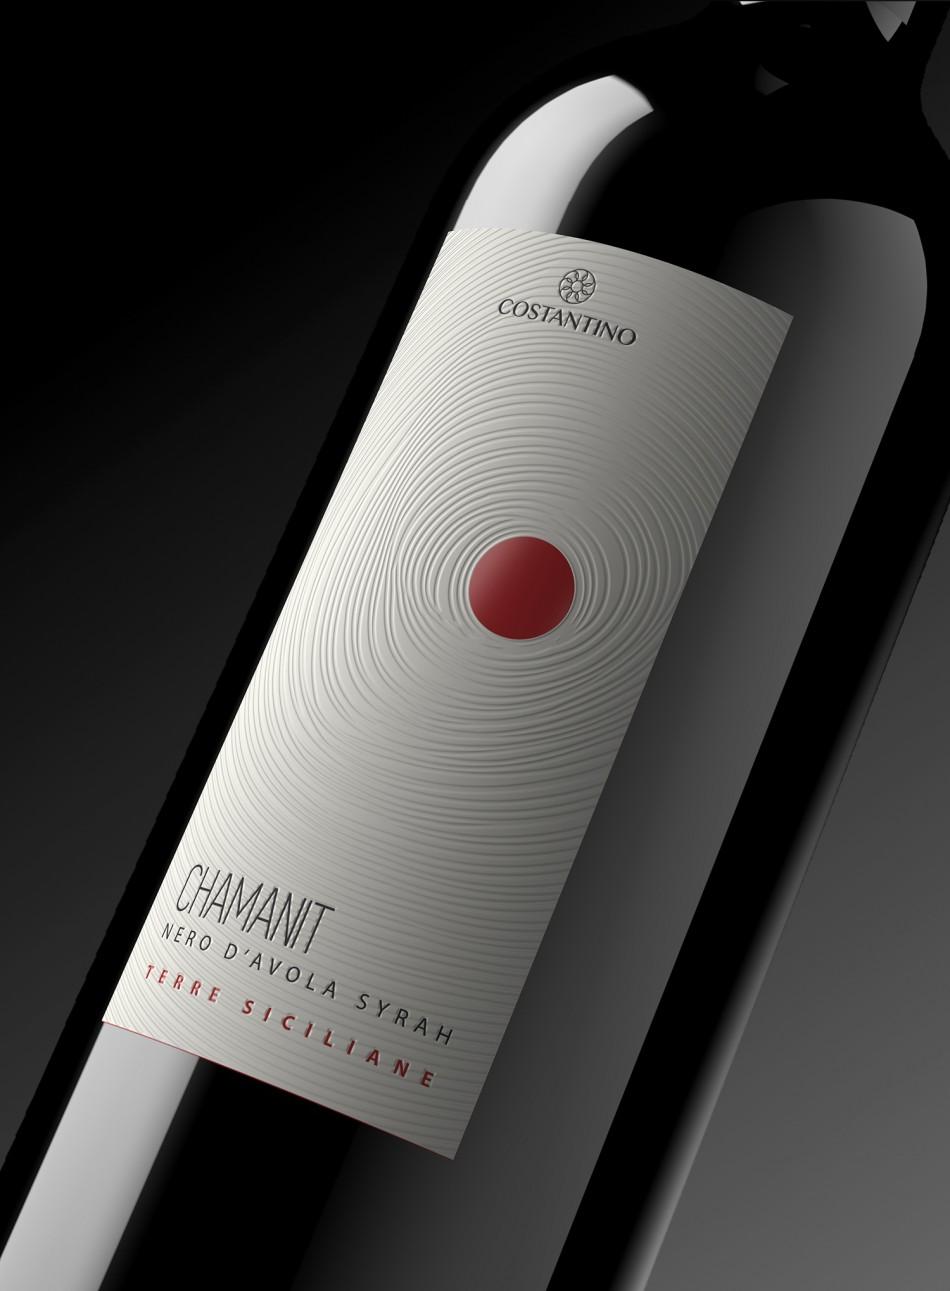 Etichetta vino Chamanit Rosso